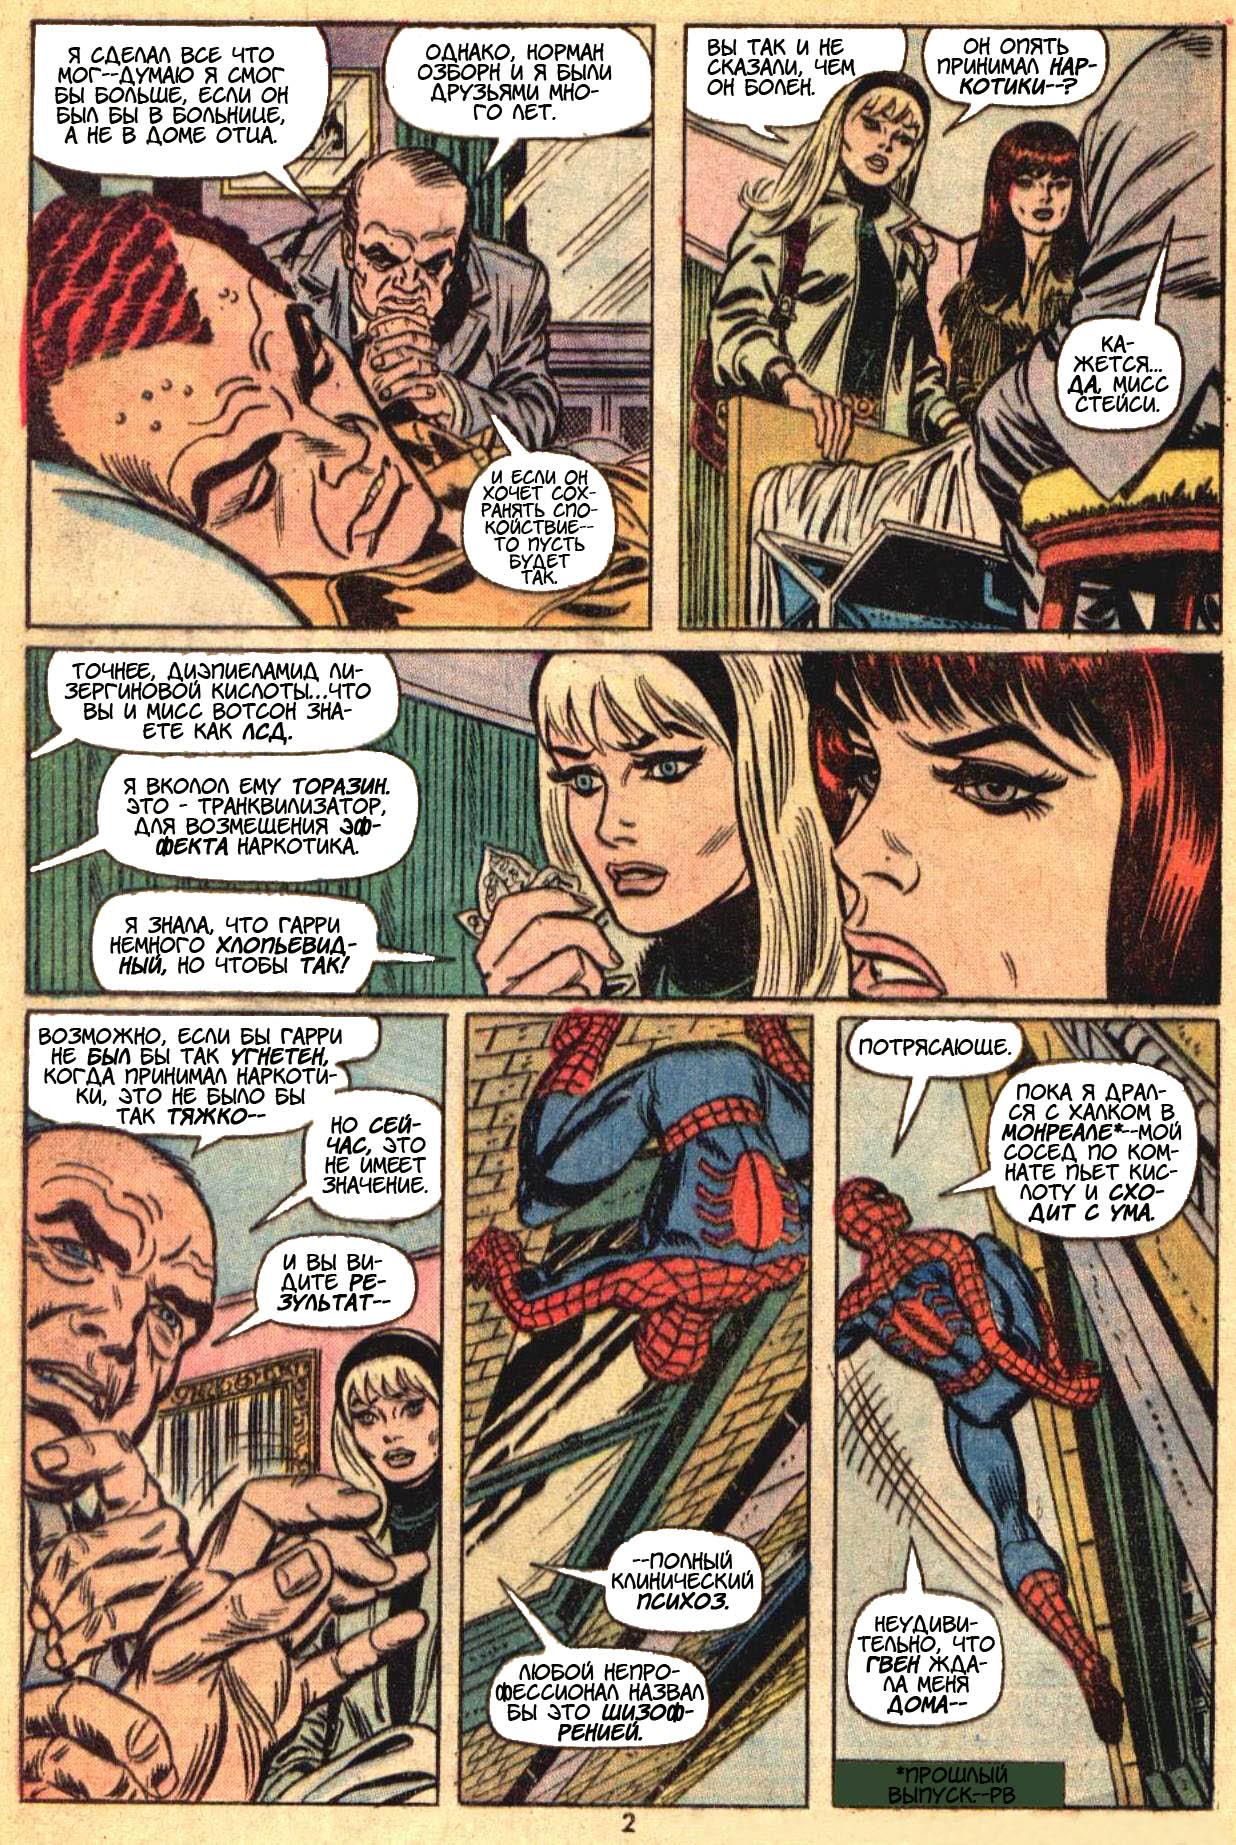 Gwen stacy spiderman comic